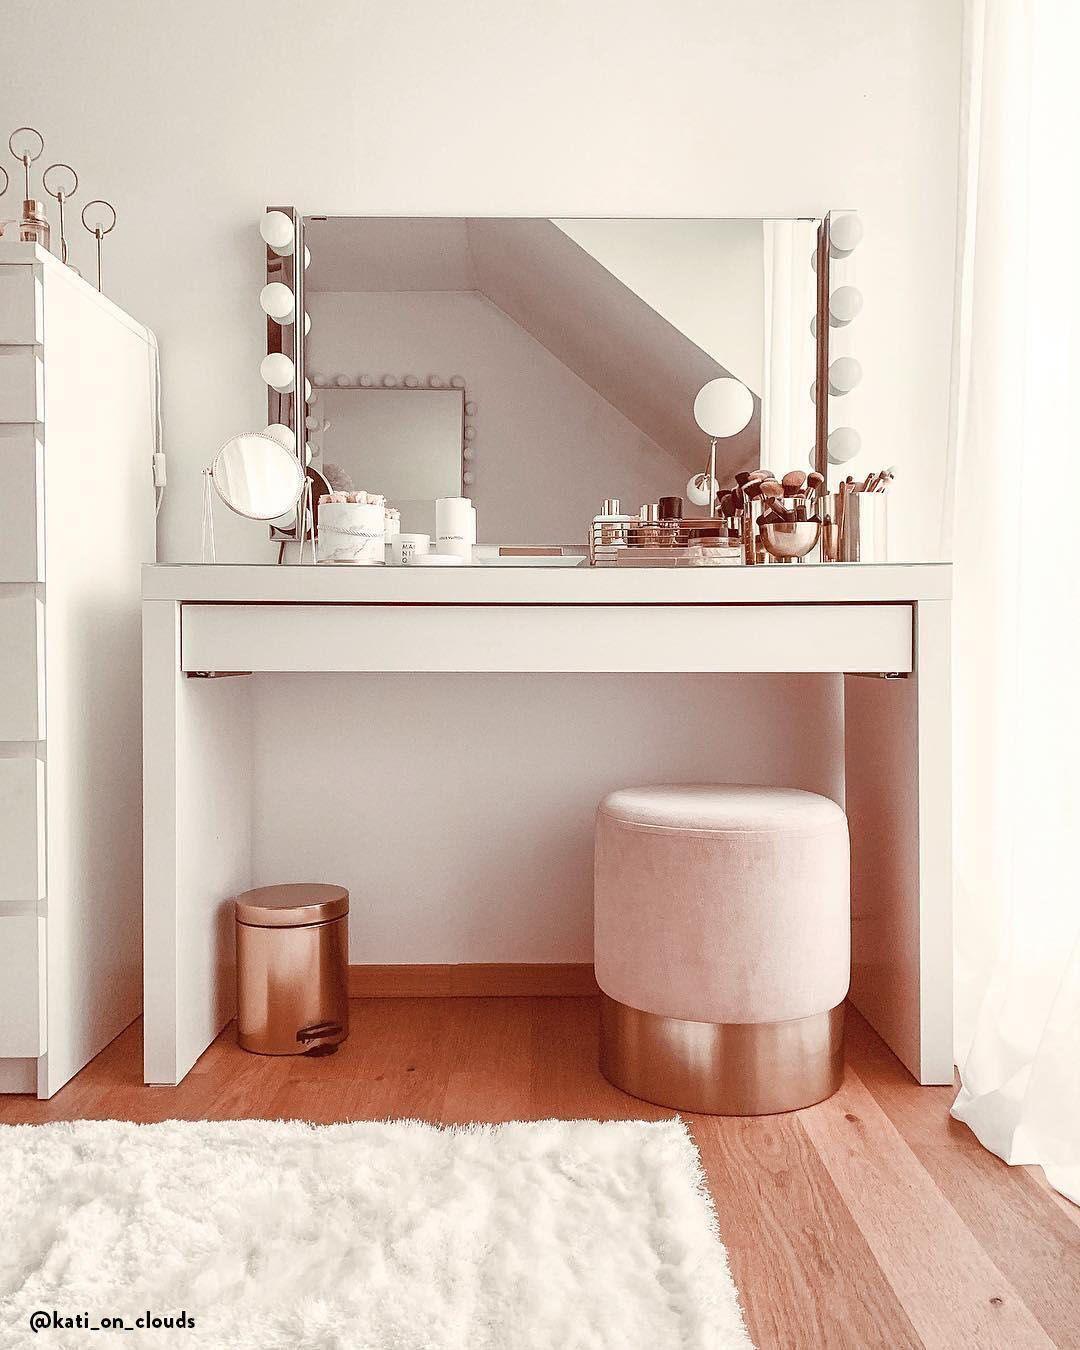 Samt Hocker Harlow Https Pickndecor Com Haus In 2020 Ideen Furs Zimmer Zimmer Gestalten Schminkzimmer